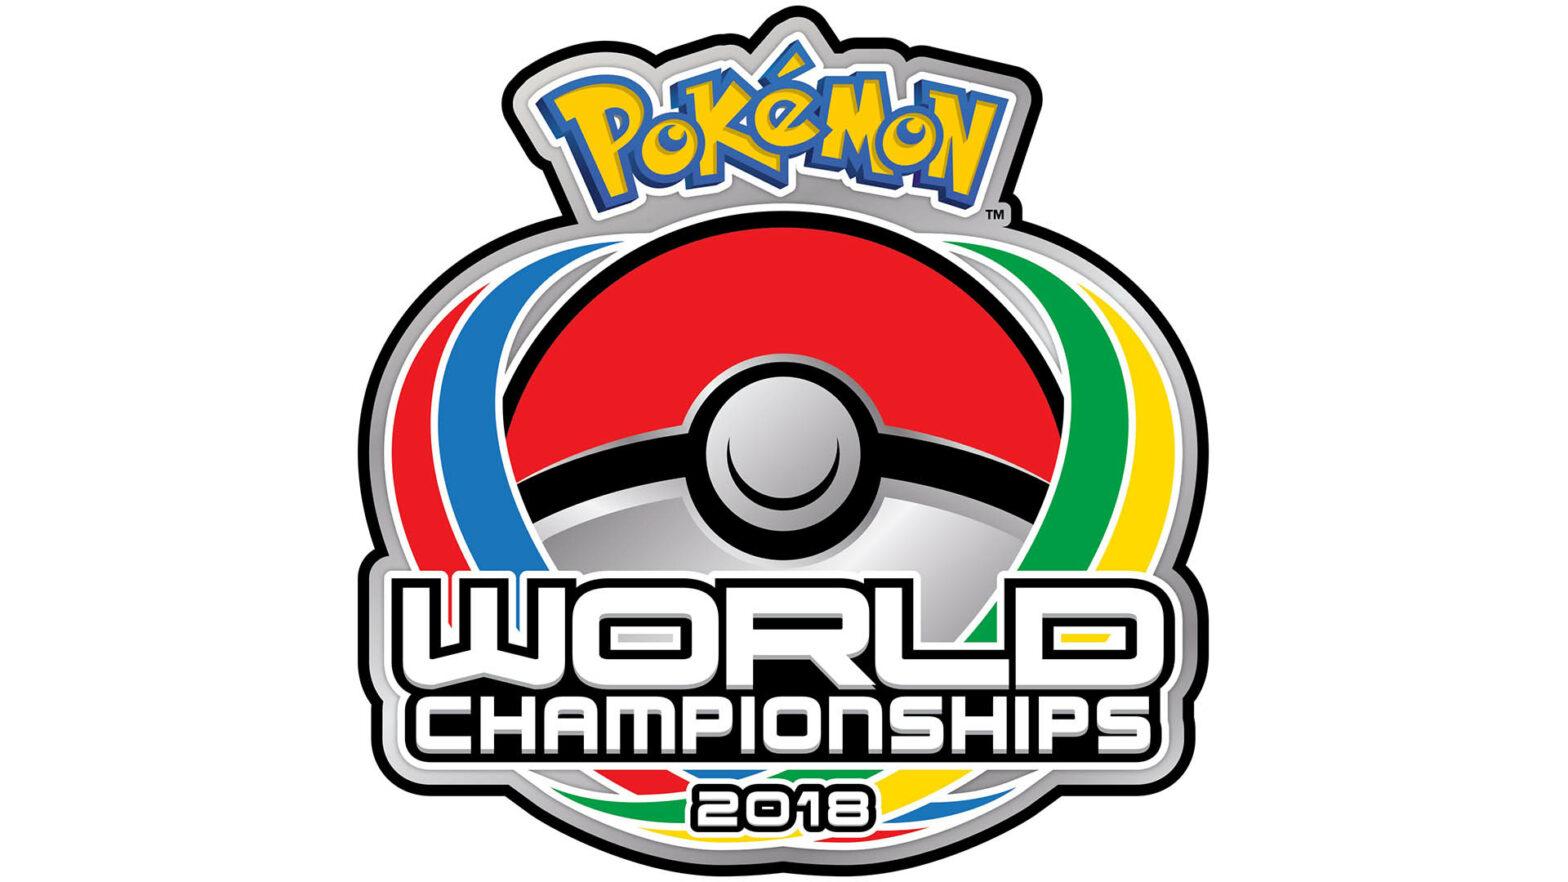 Streaming-Programm zu den Pokémon-Weltmeisterschaften 2018